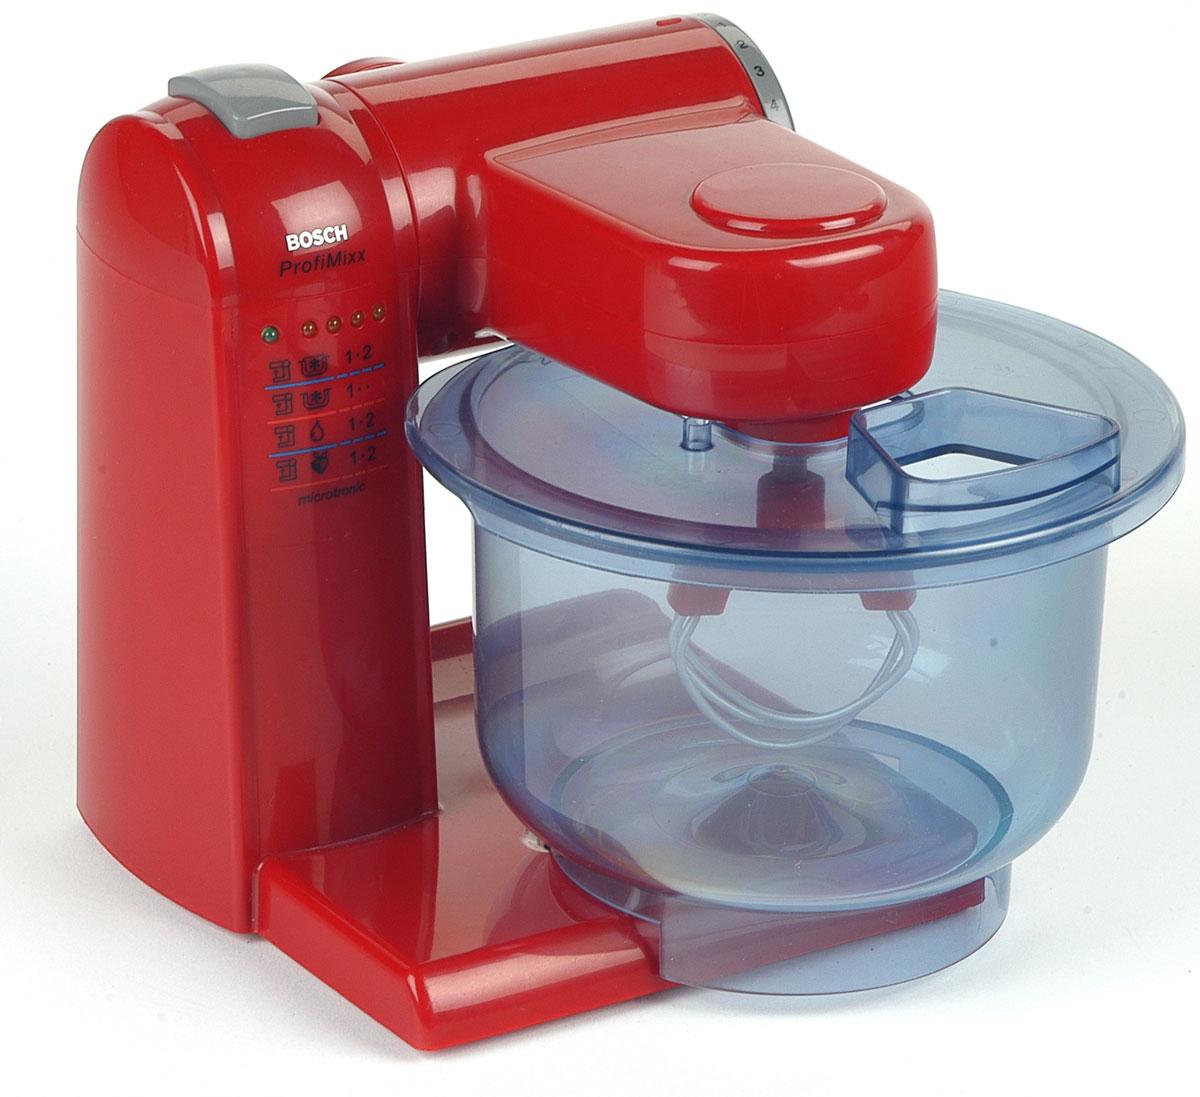 Klein Кухонная машина Bosch - Сюжетно-ролевые игрушки